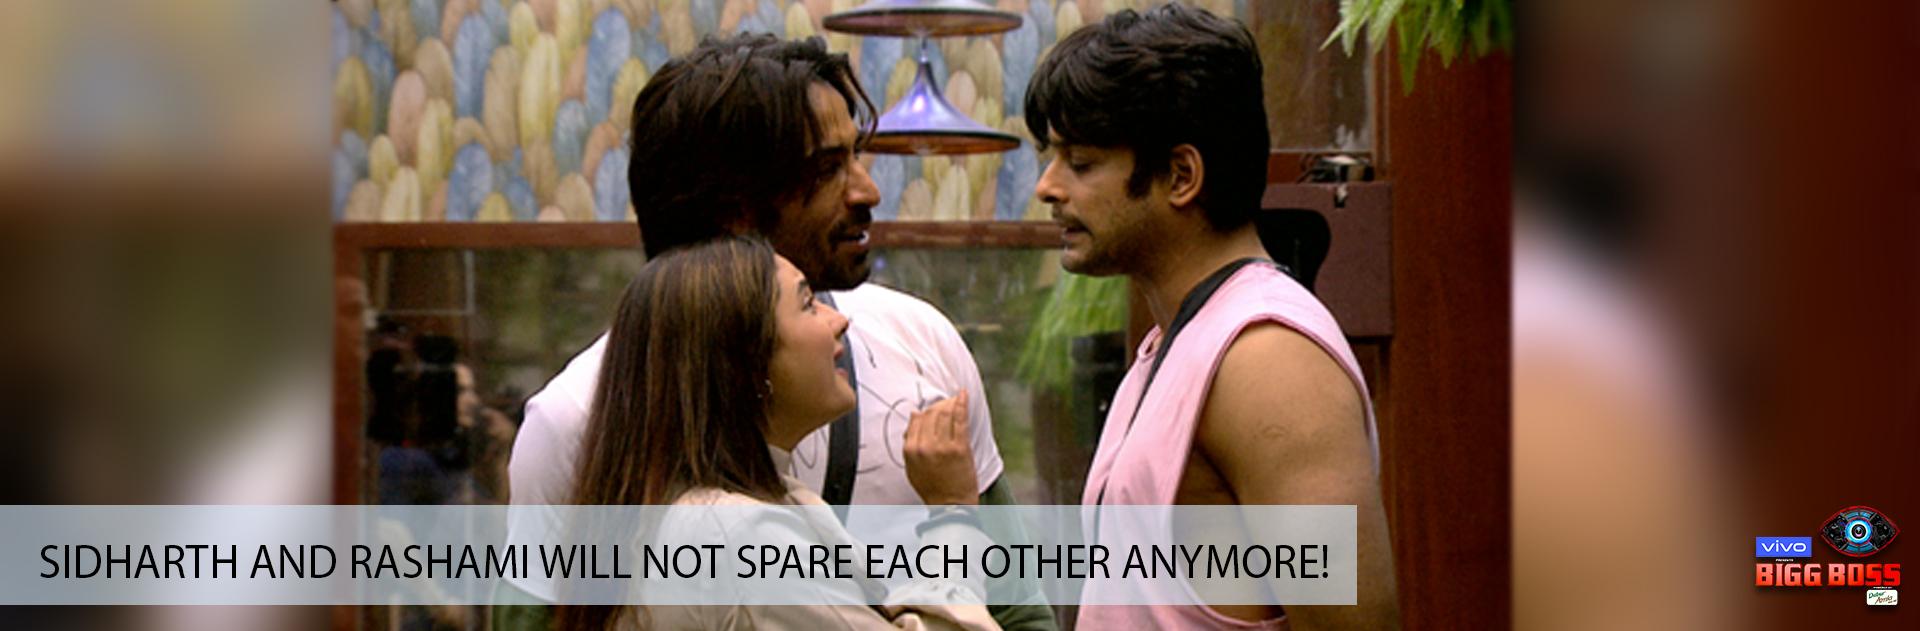 Rashami Desai and Sidharth Shukla don't spare each other!